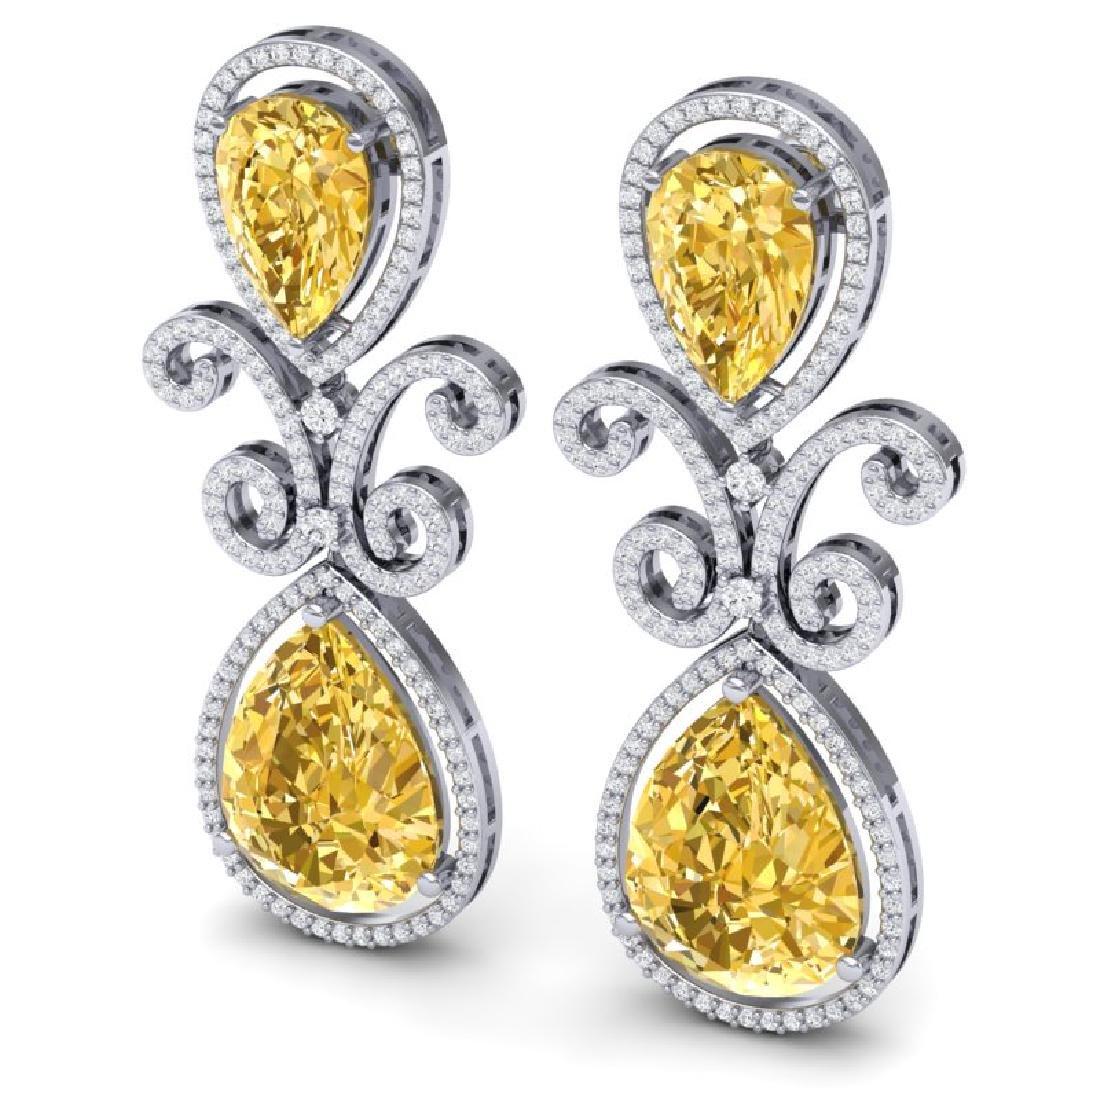 27.31 CTW Royalty Canary Citrine & VS Diamond Earrings